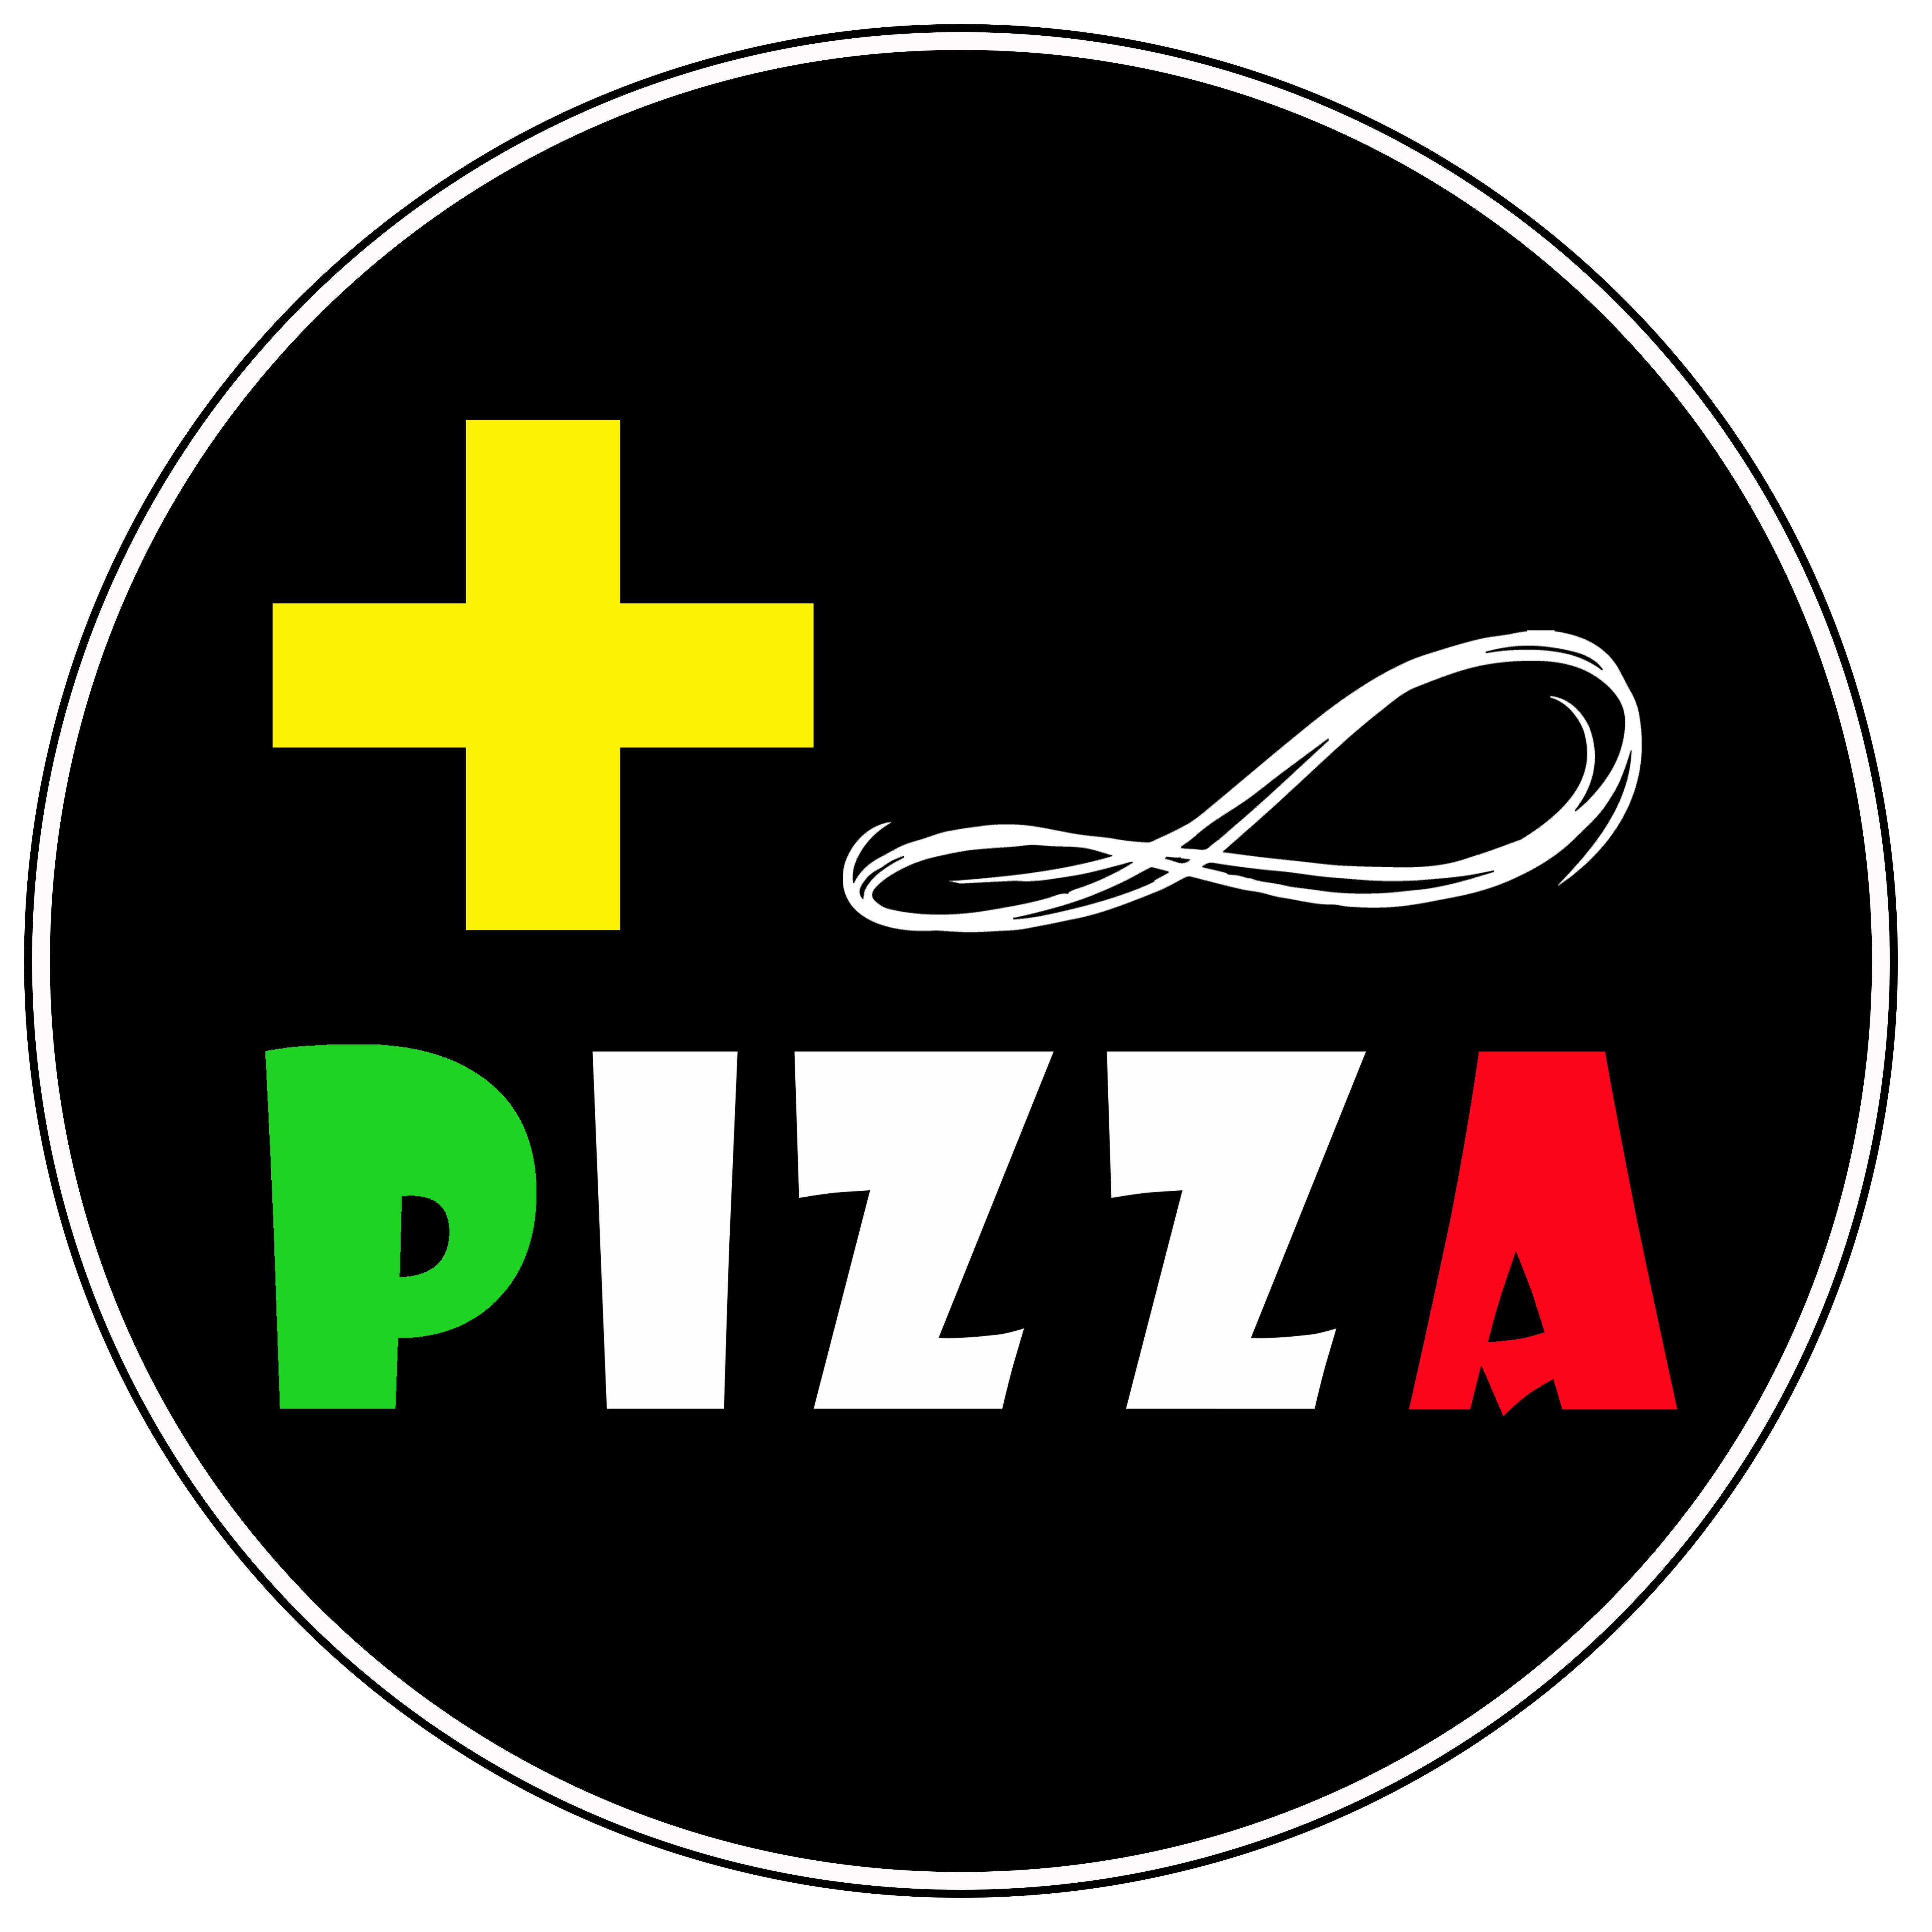 + Pizza